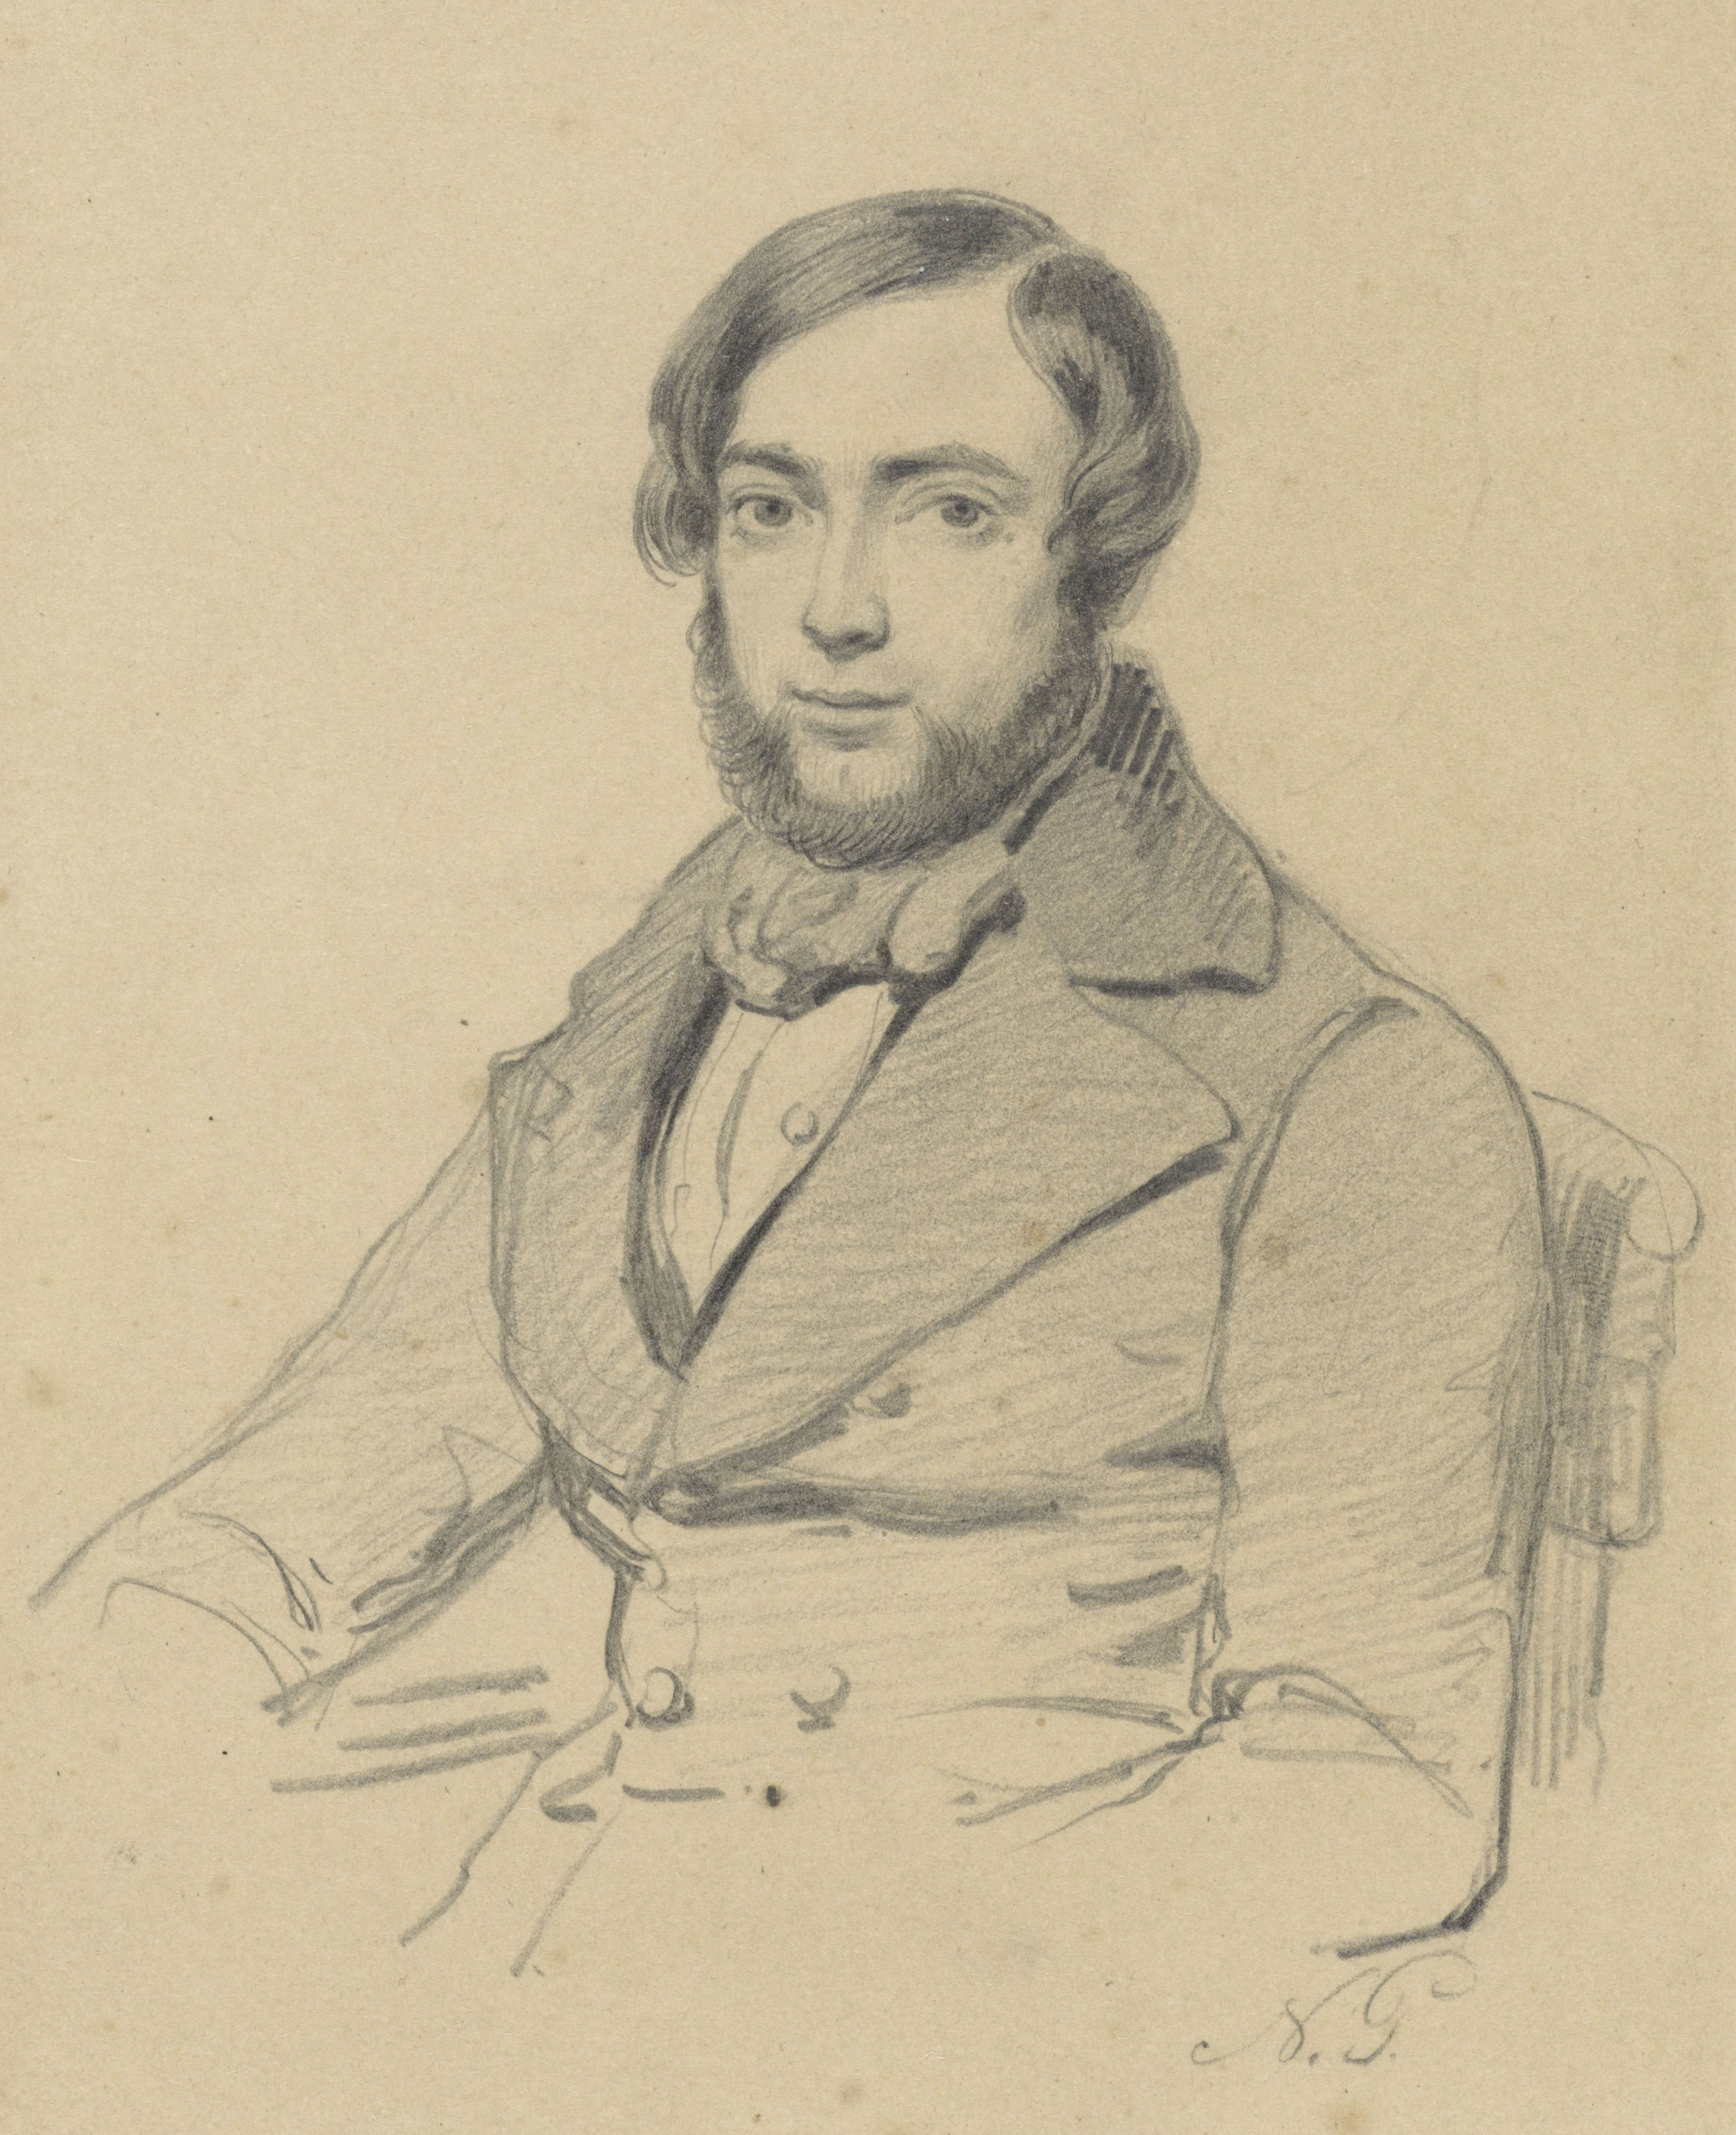 Image of Johan Coenraad Hamburger from Wikidata